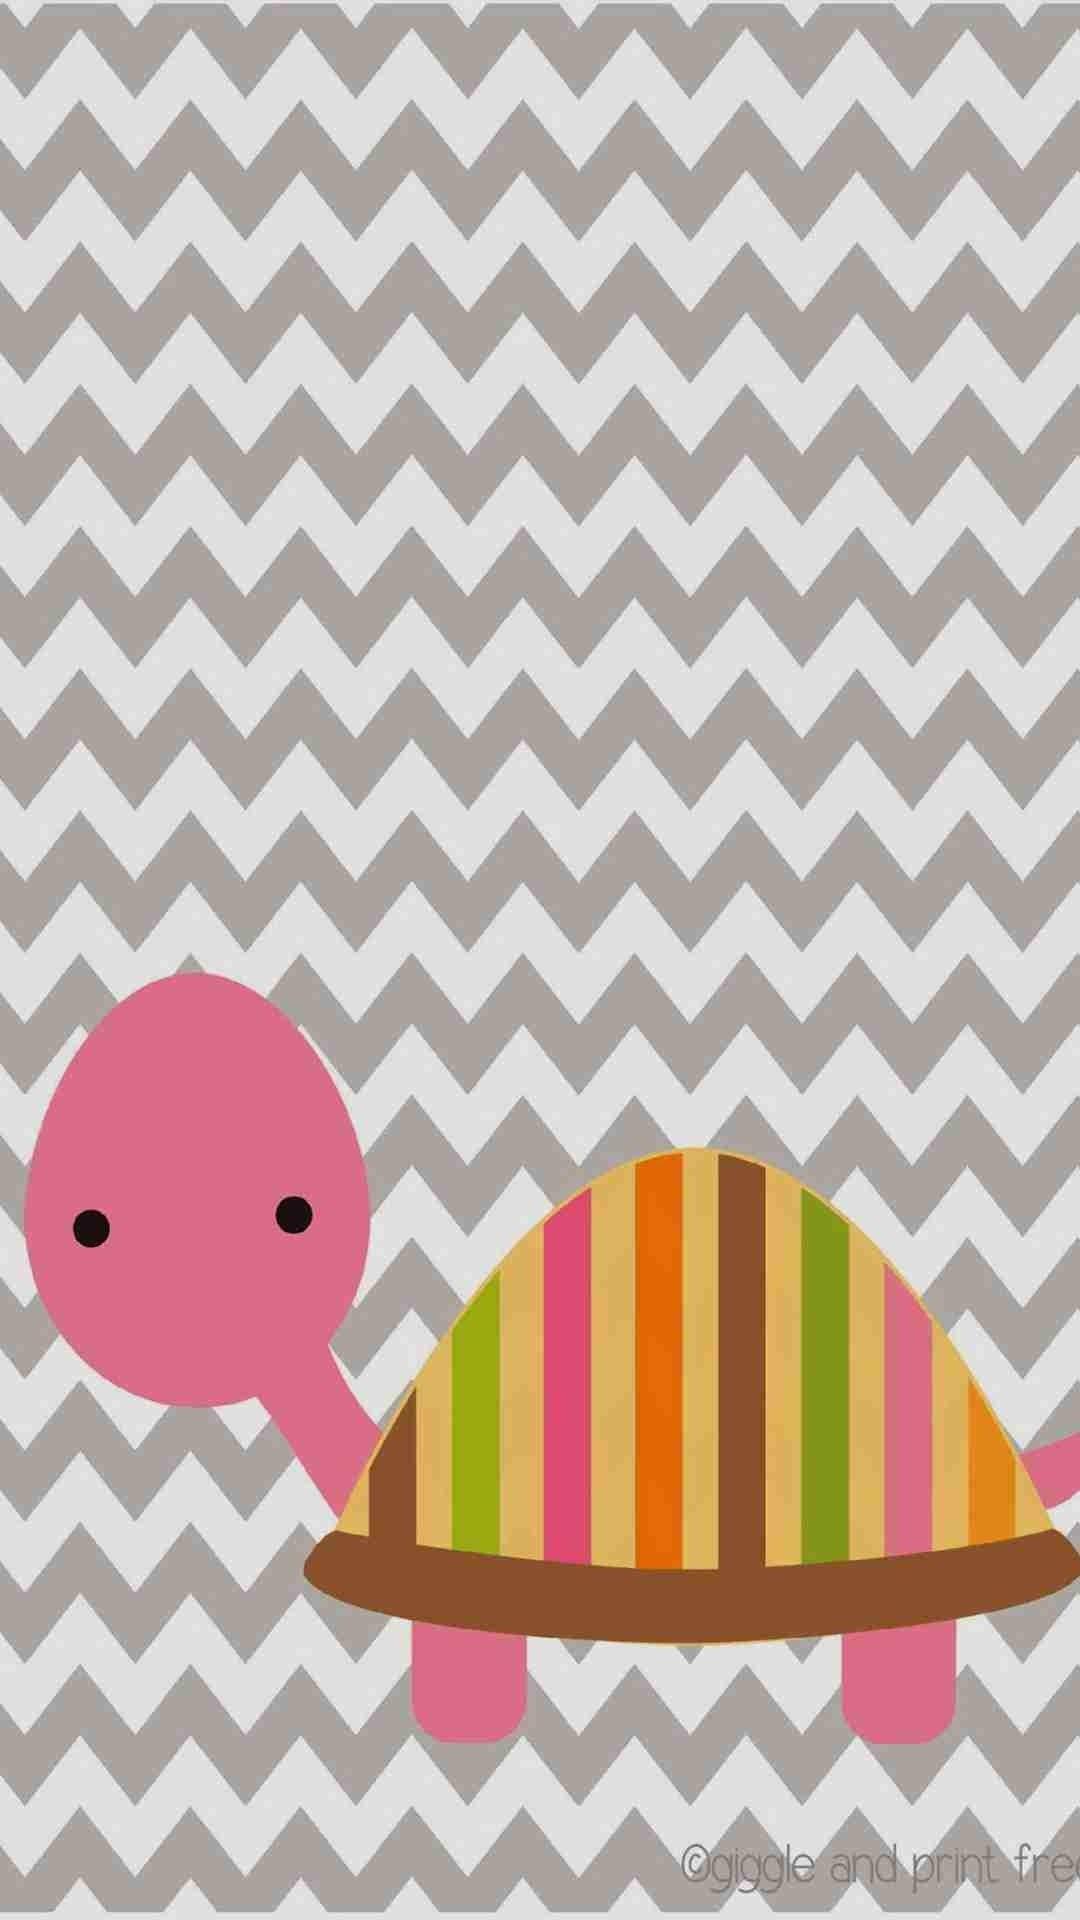 diy cute pink tortoise pattern chevron iphone 6 plus